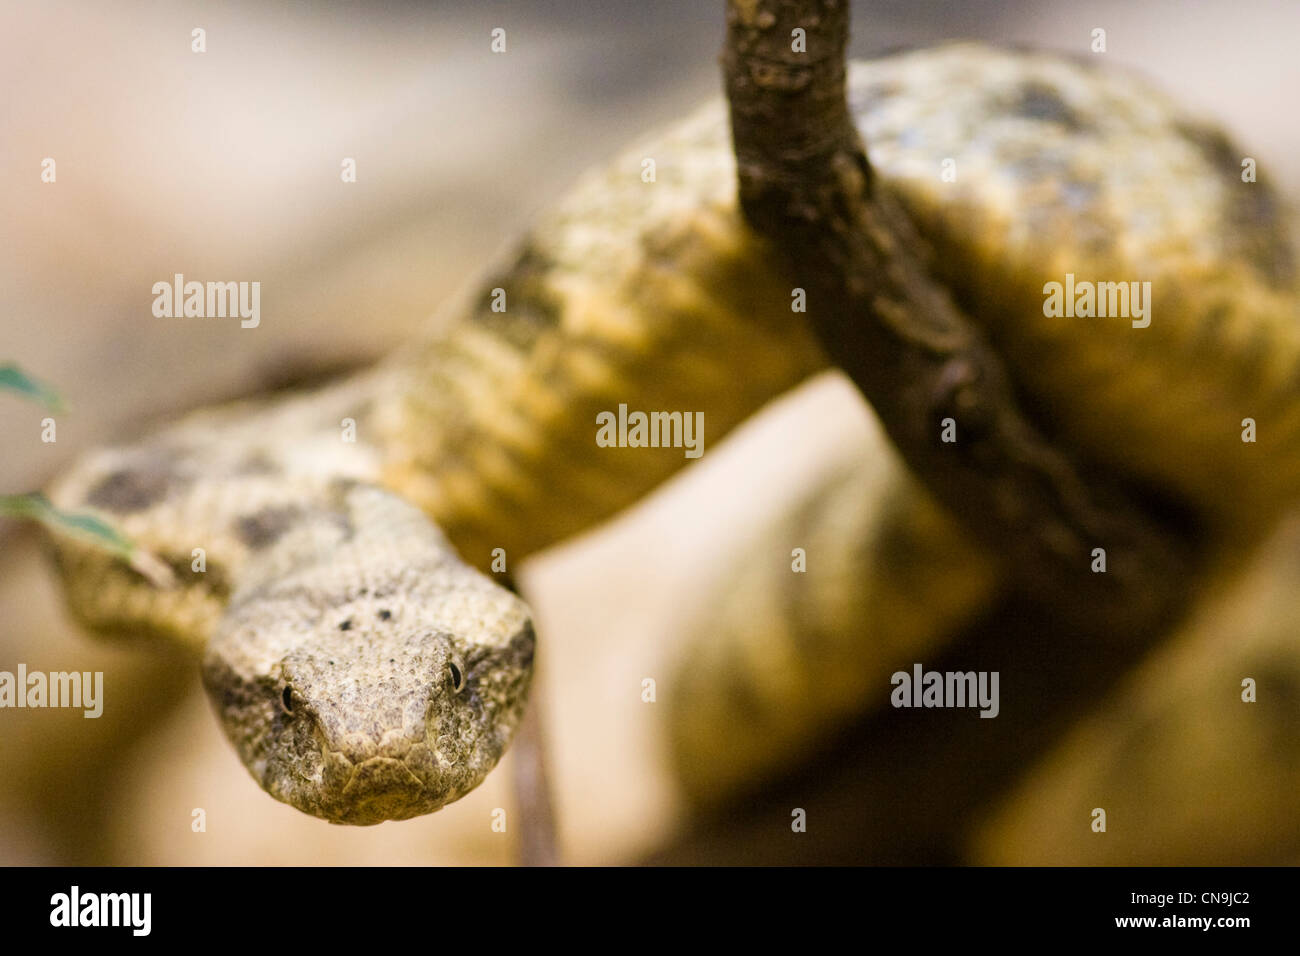 Macrovipera lebetina vipère du Levant - - serpent venimeux Photo Stock